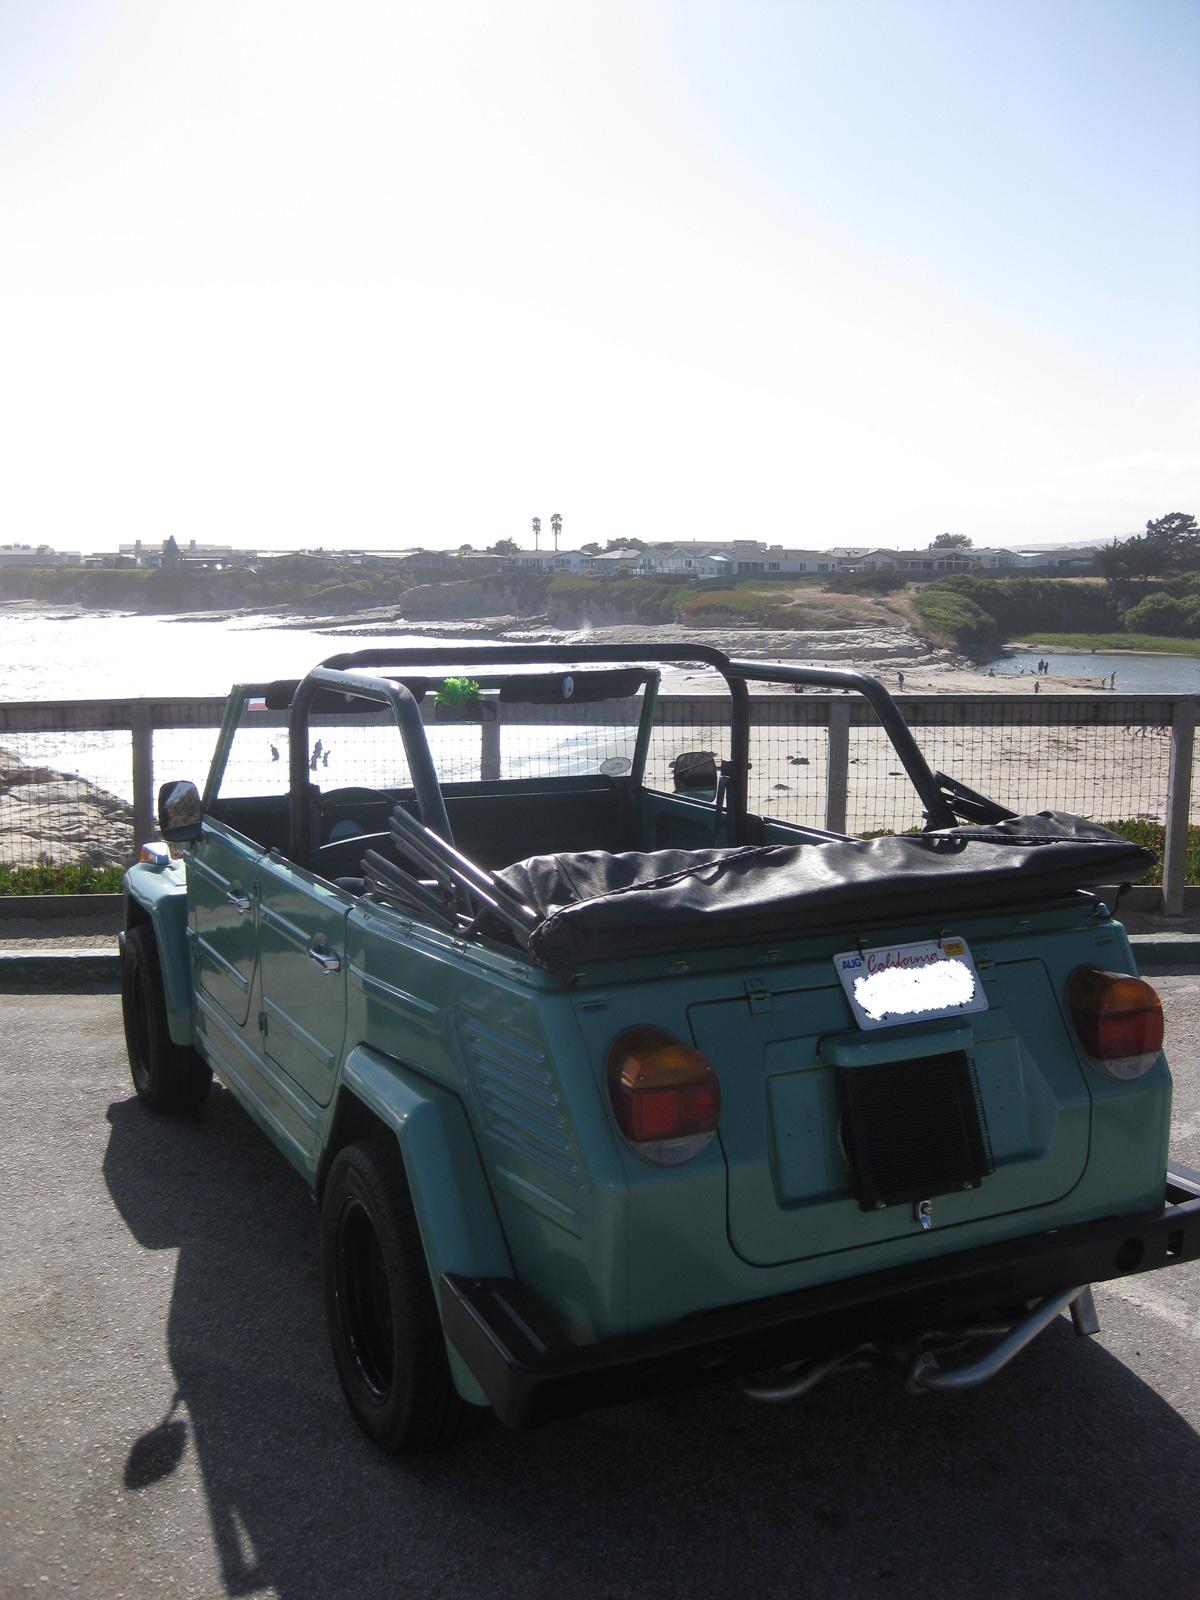 Trip to Santa Cruz in the Thing